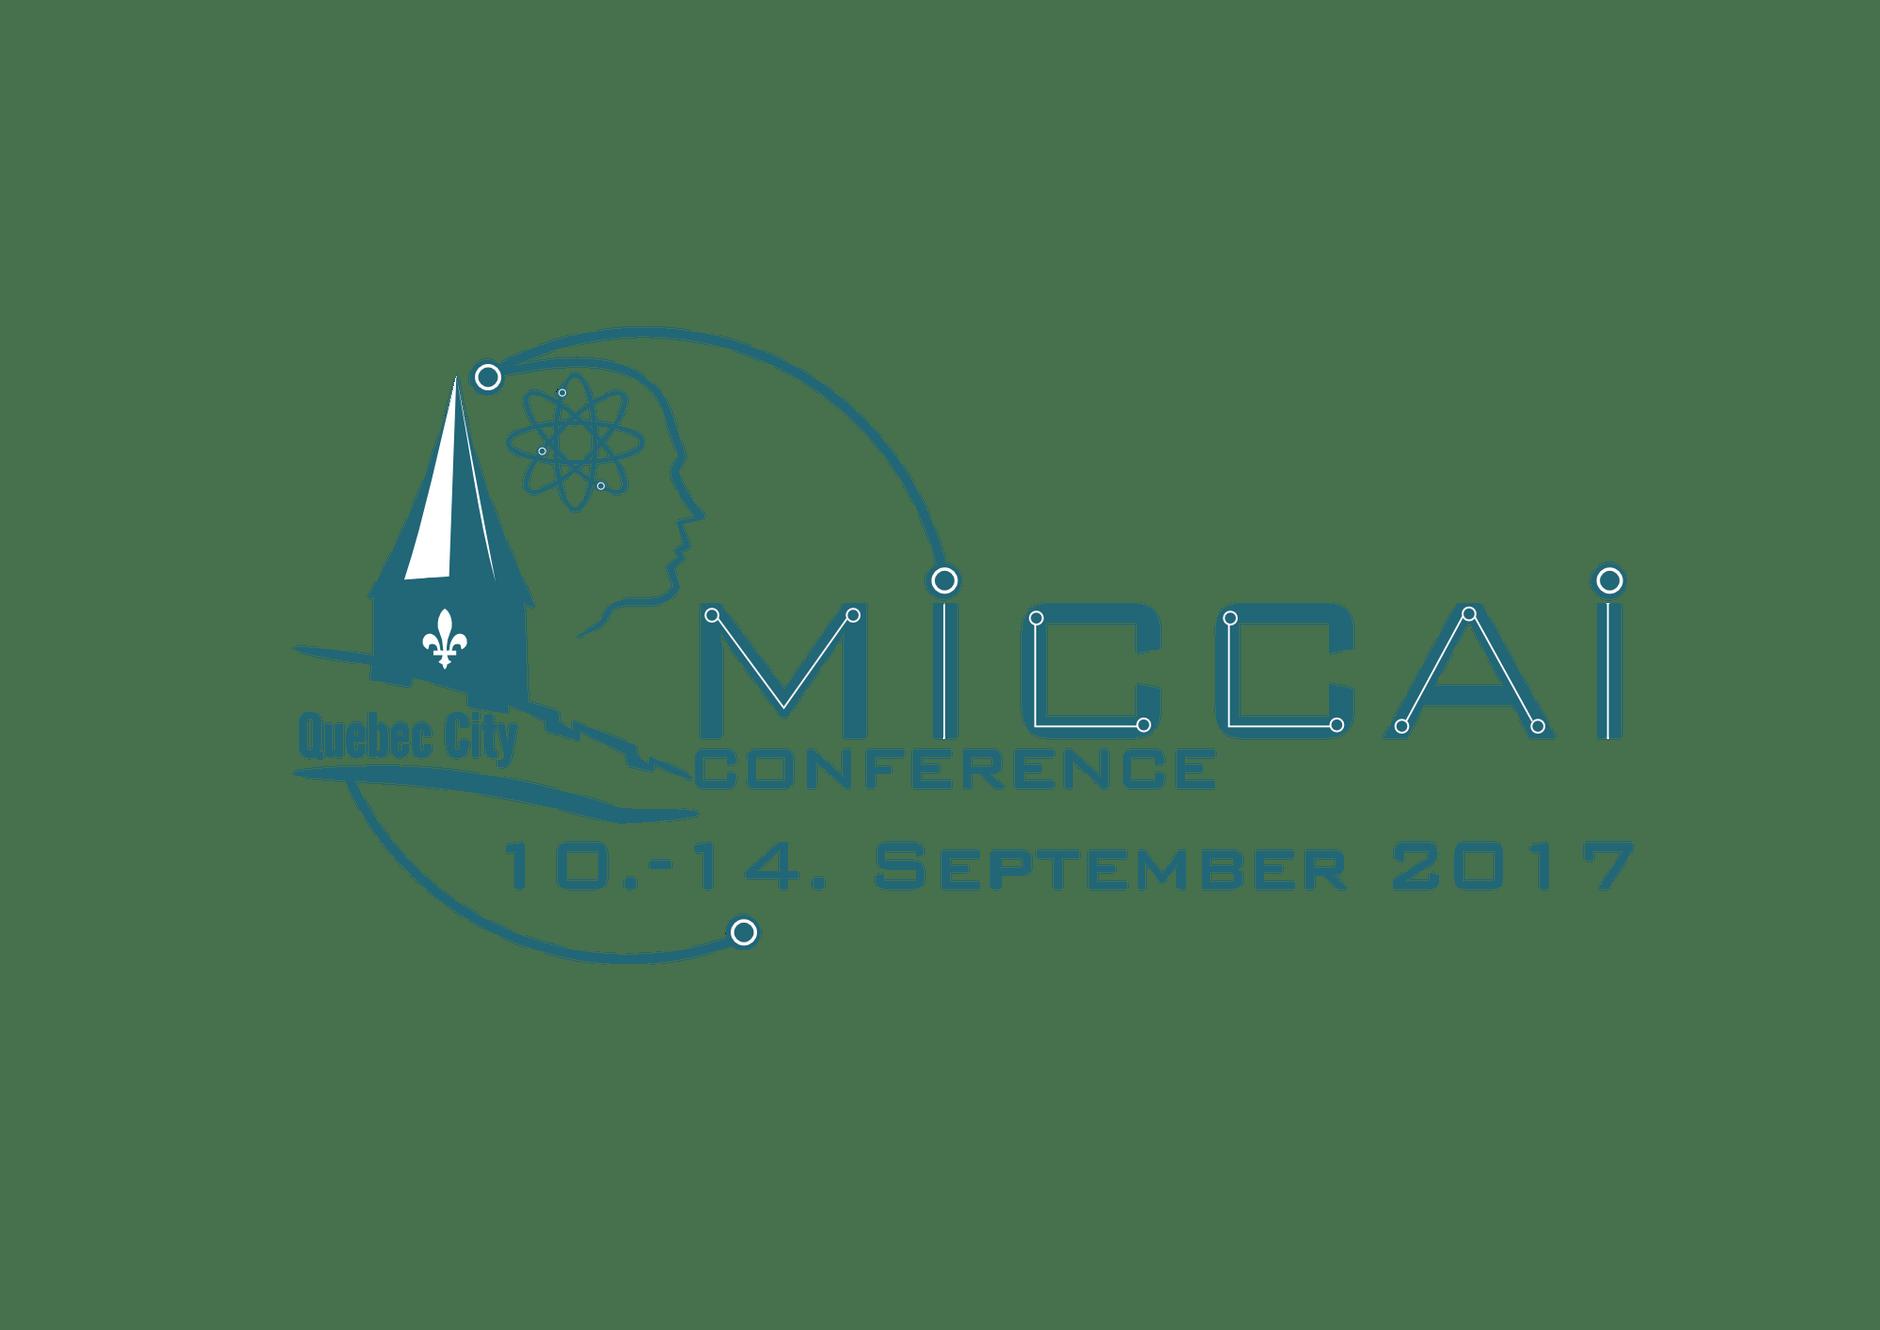 MICCAI 2017 Conference